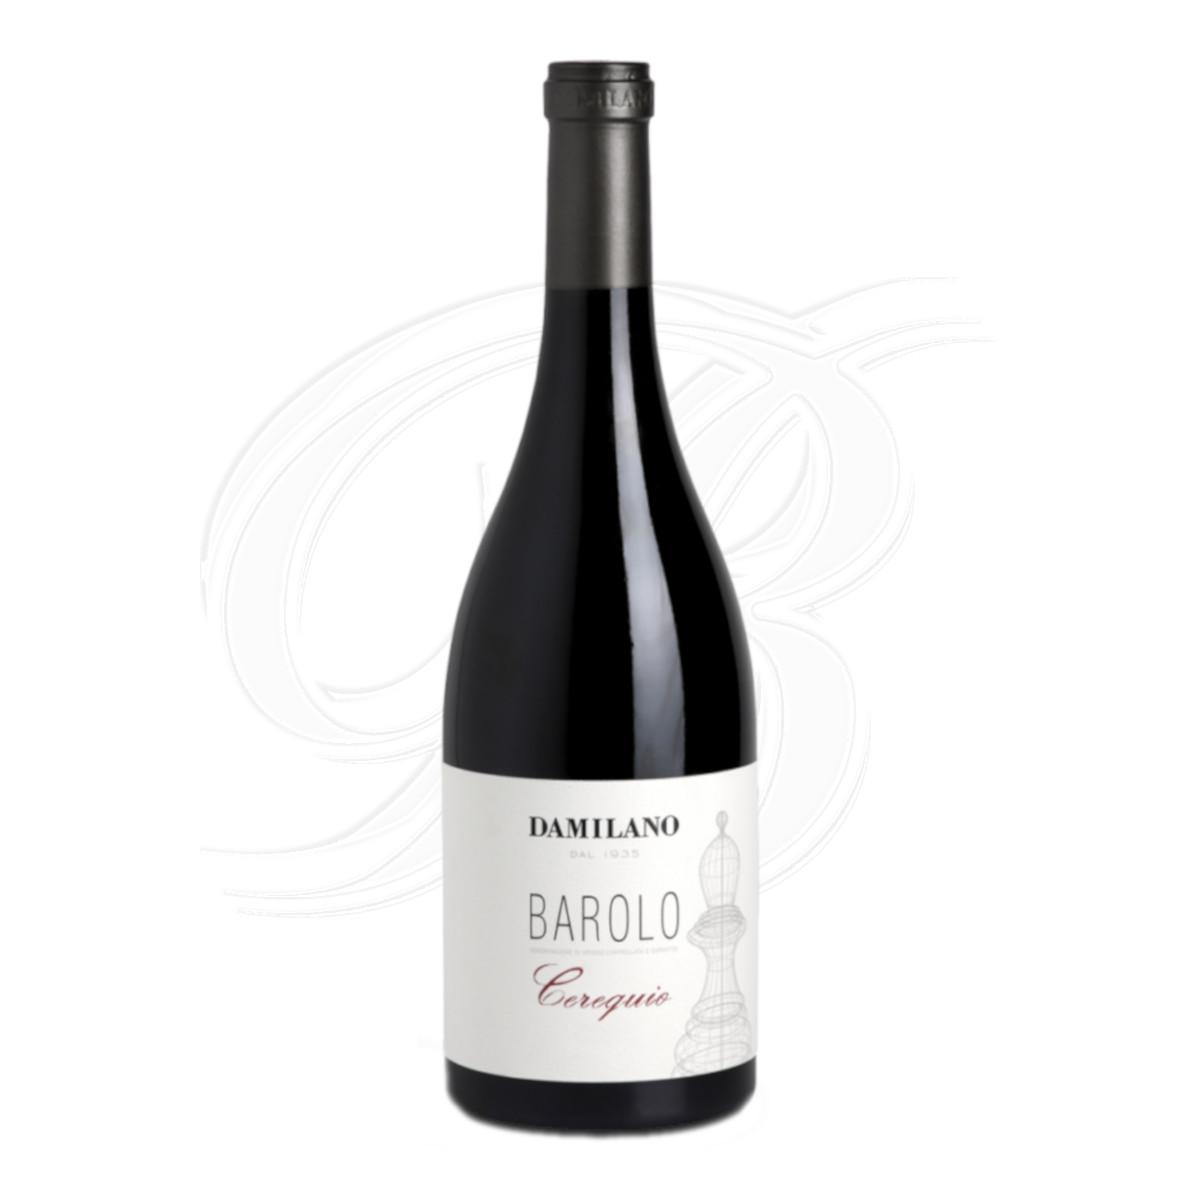 Barolo Cerequio von Damilano